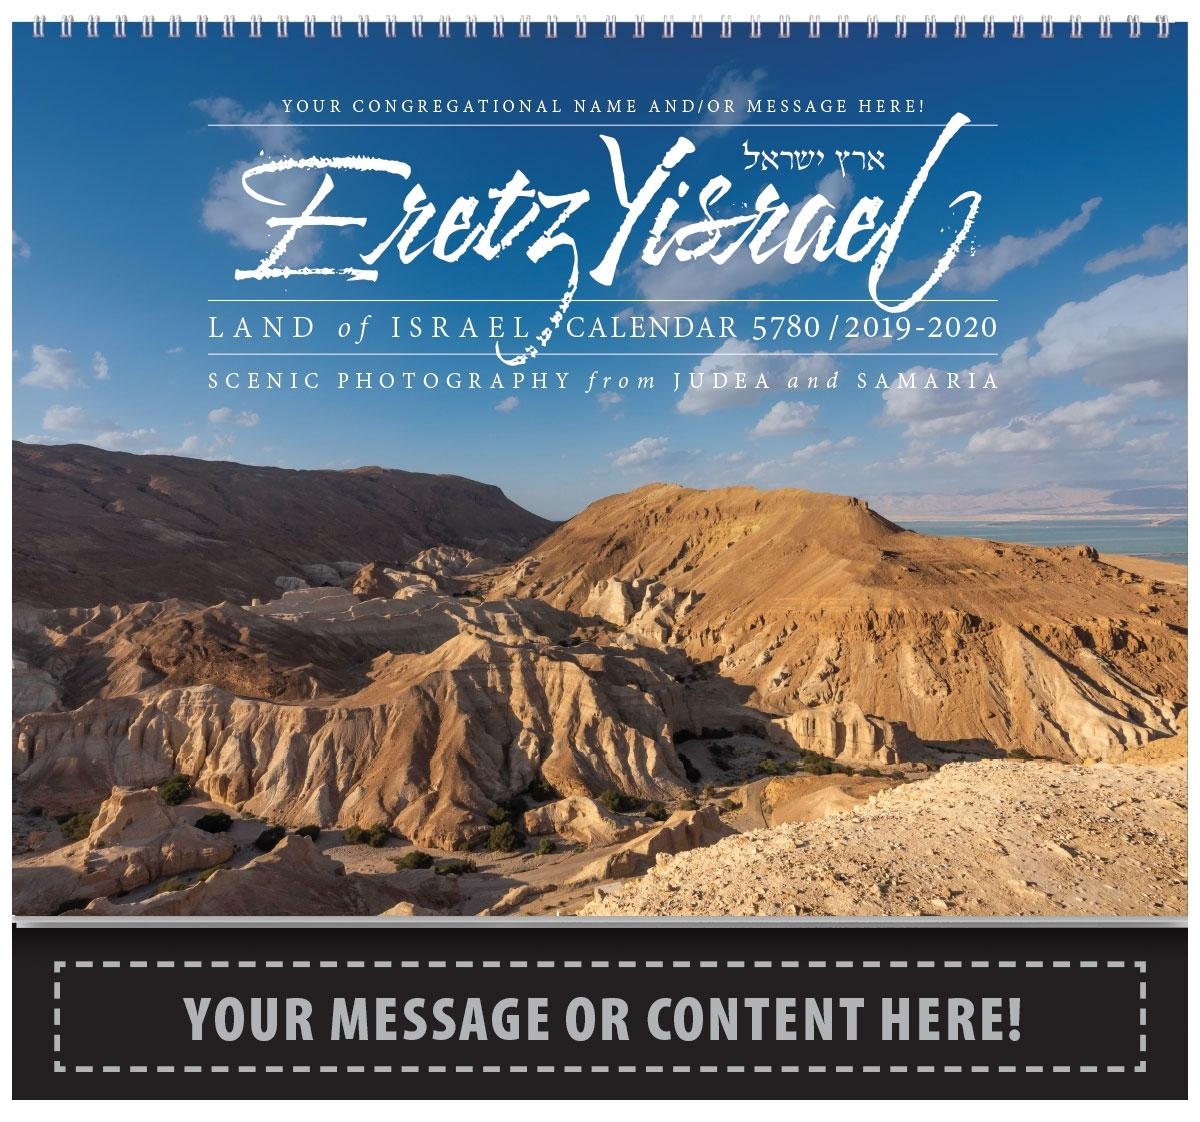 Custom Eretz Yisrael / Land Of Israel Calendar intended for Weekly Torah Parsha Calendar For 2019/2020